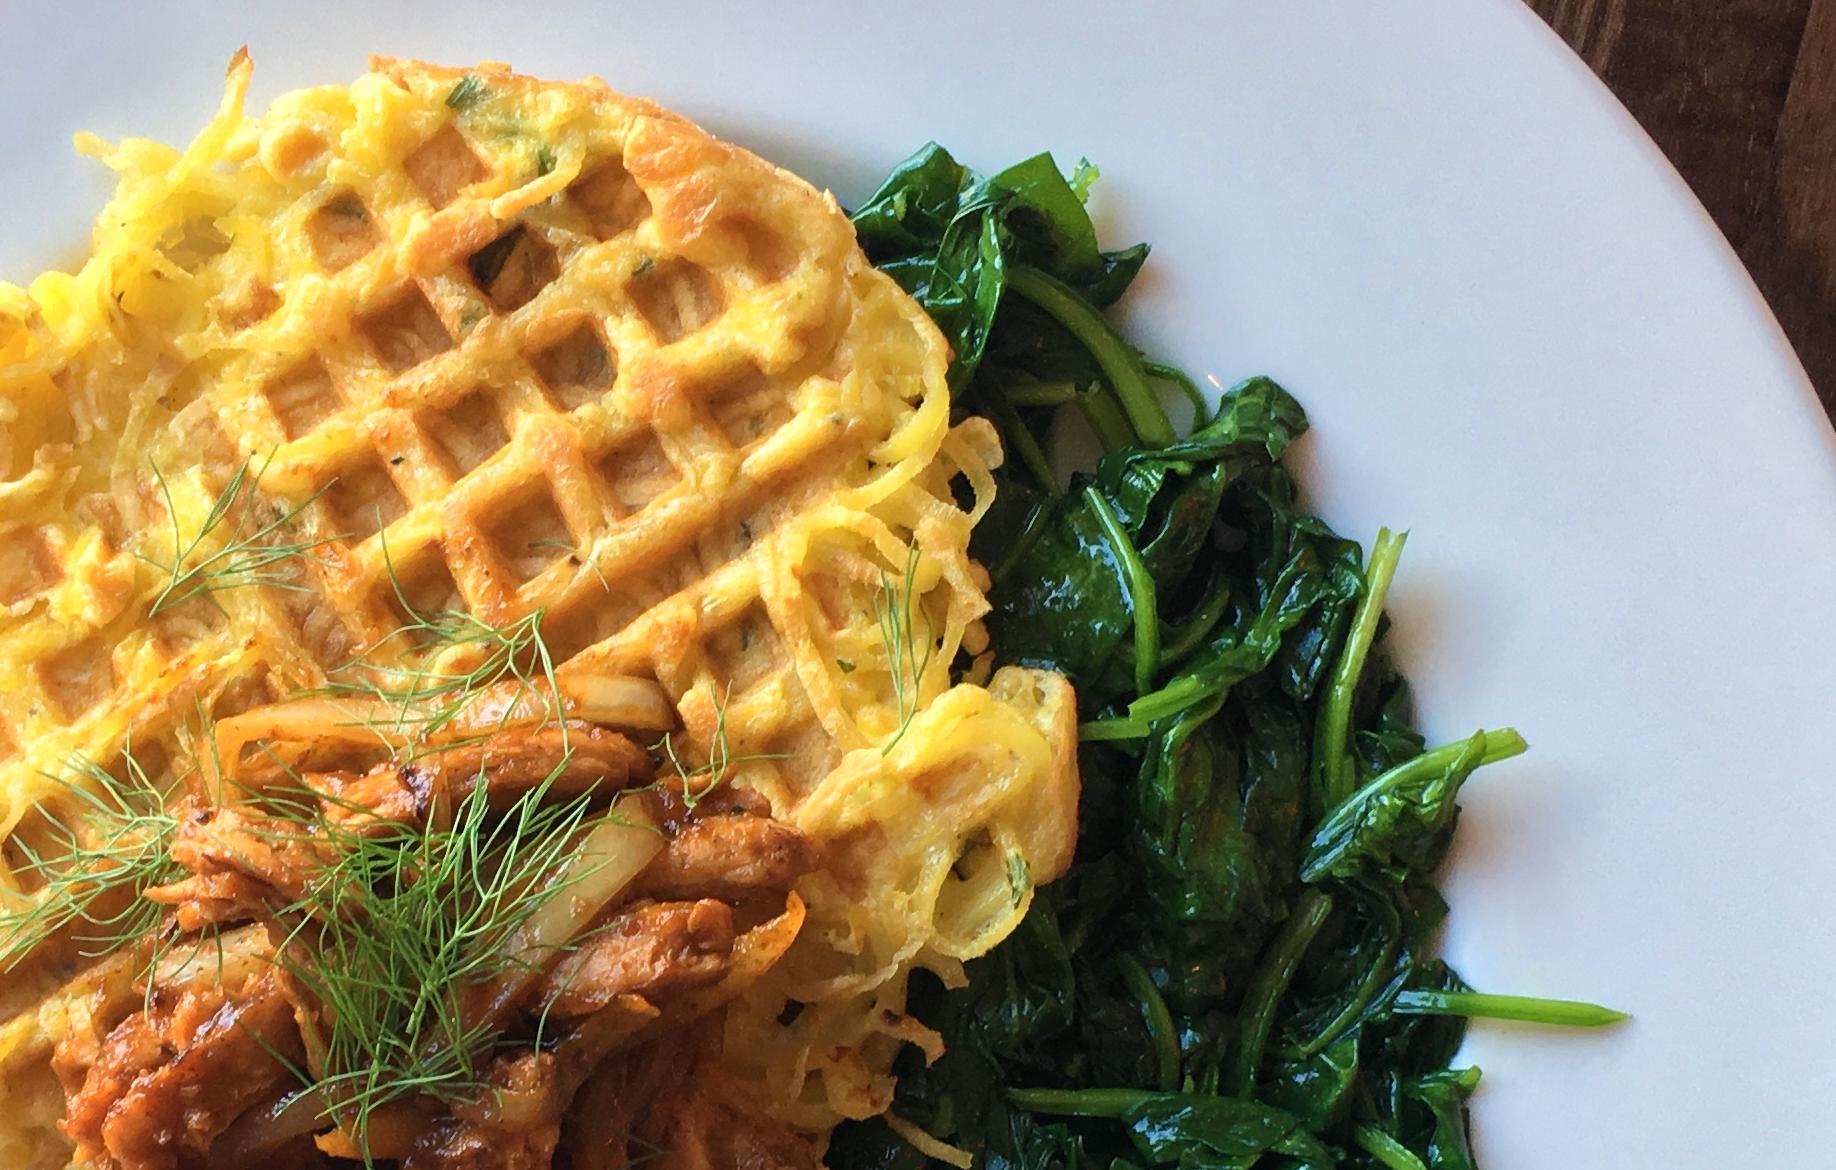 Citizen Eatery's parsnip waffles